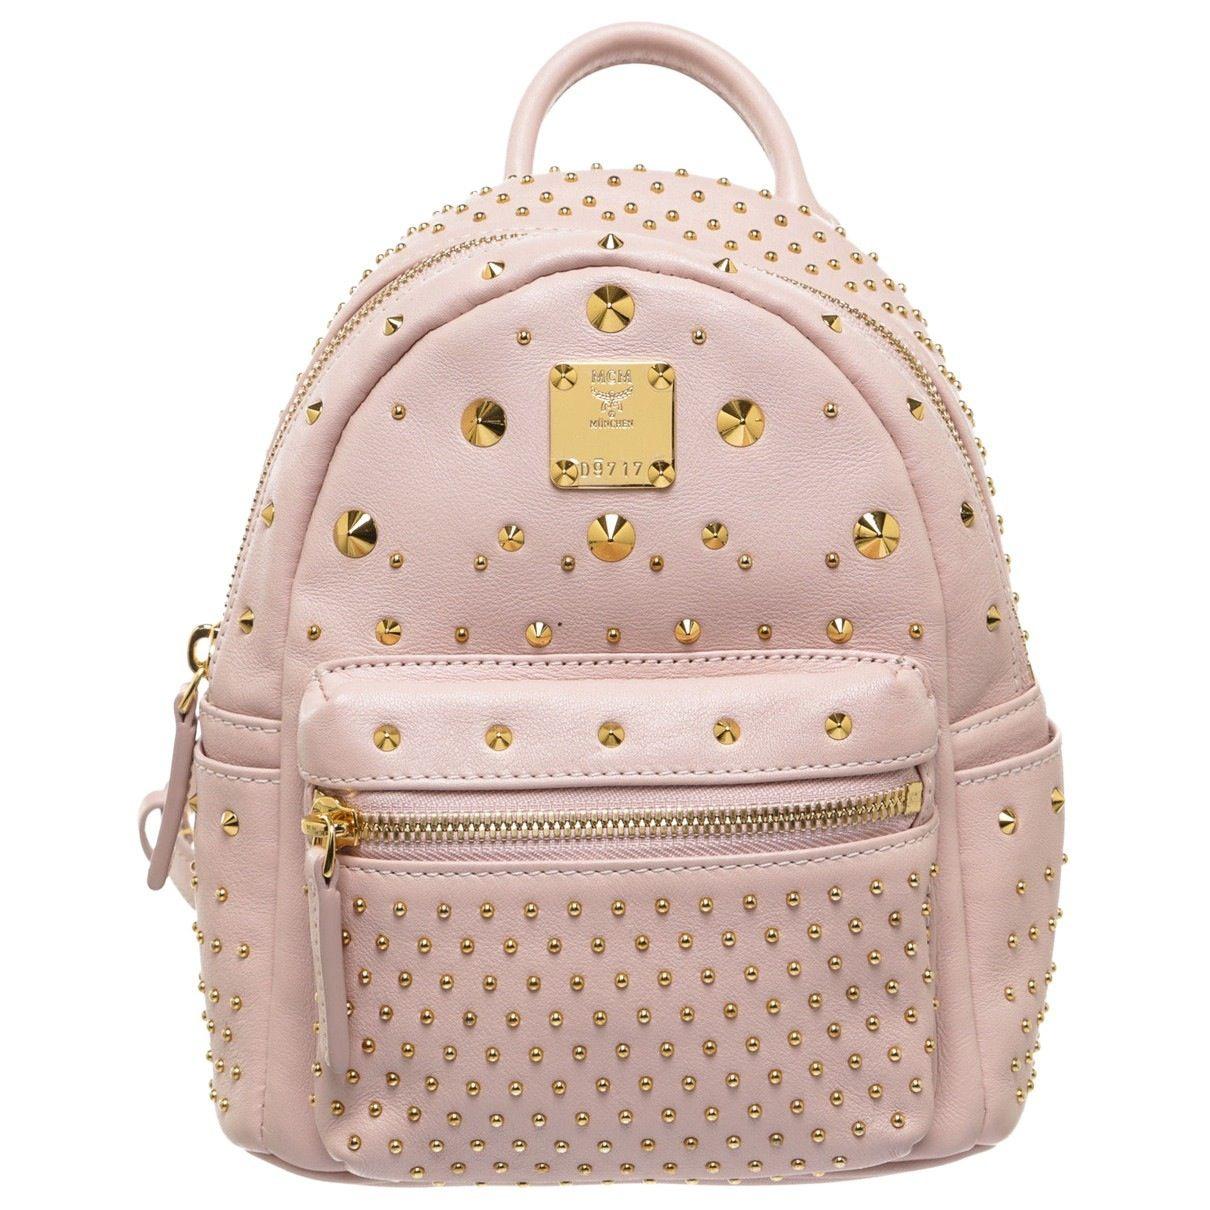 Baby Pink Backpack   MCM   Catchys   Mcm tasche, Taschen